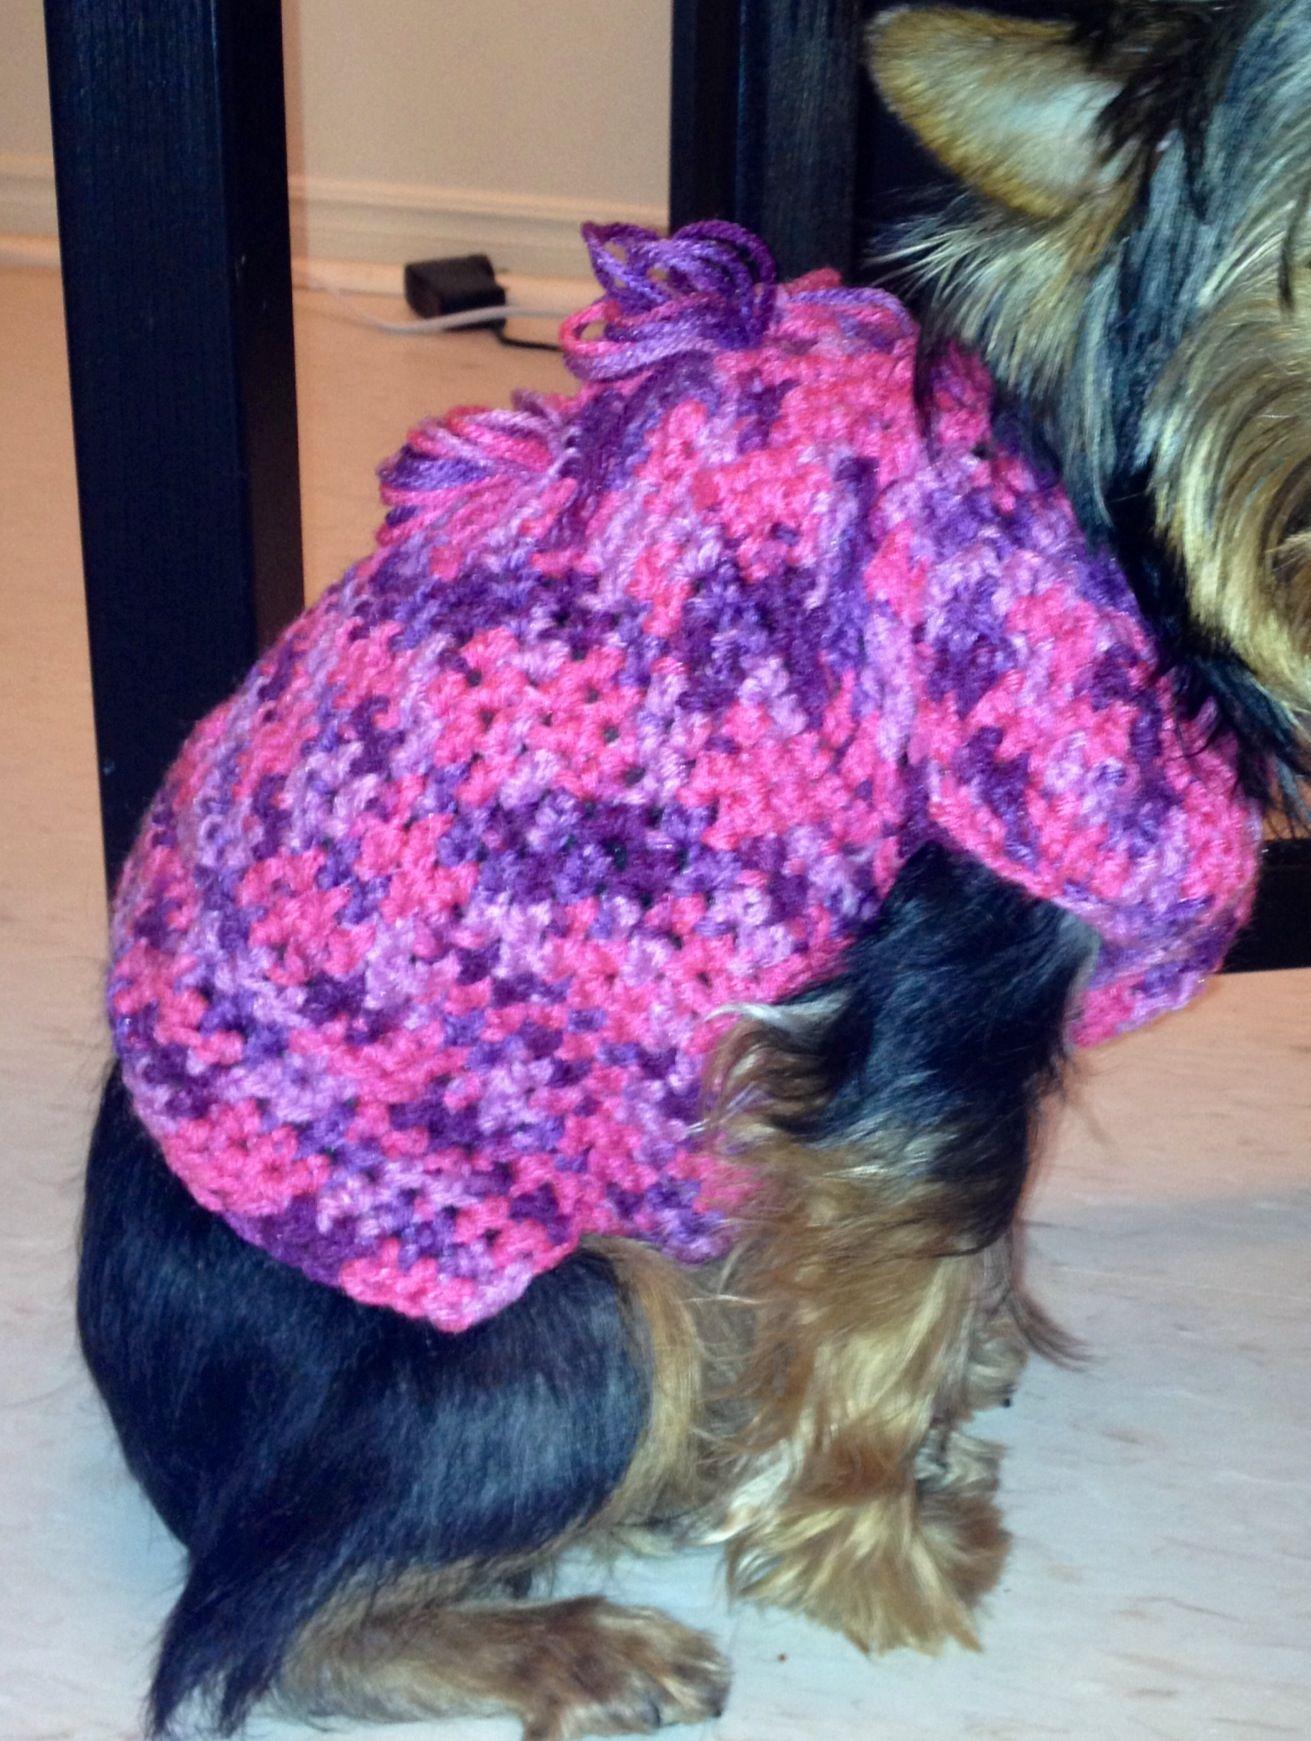 Crochet Dog Sweater : Crochet dog sweater Make me! Pinterest